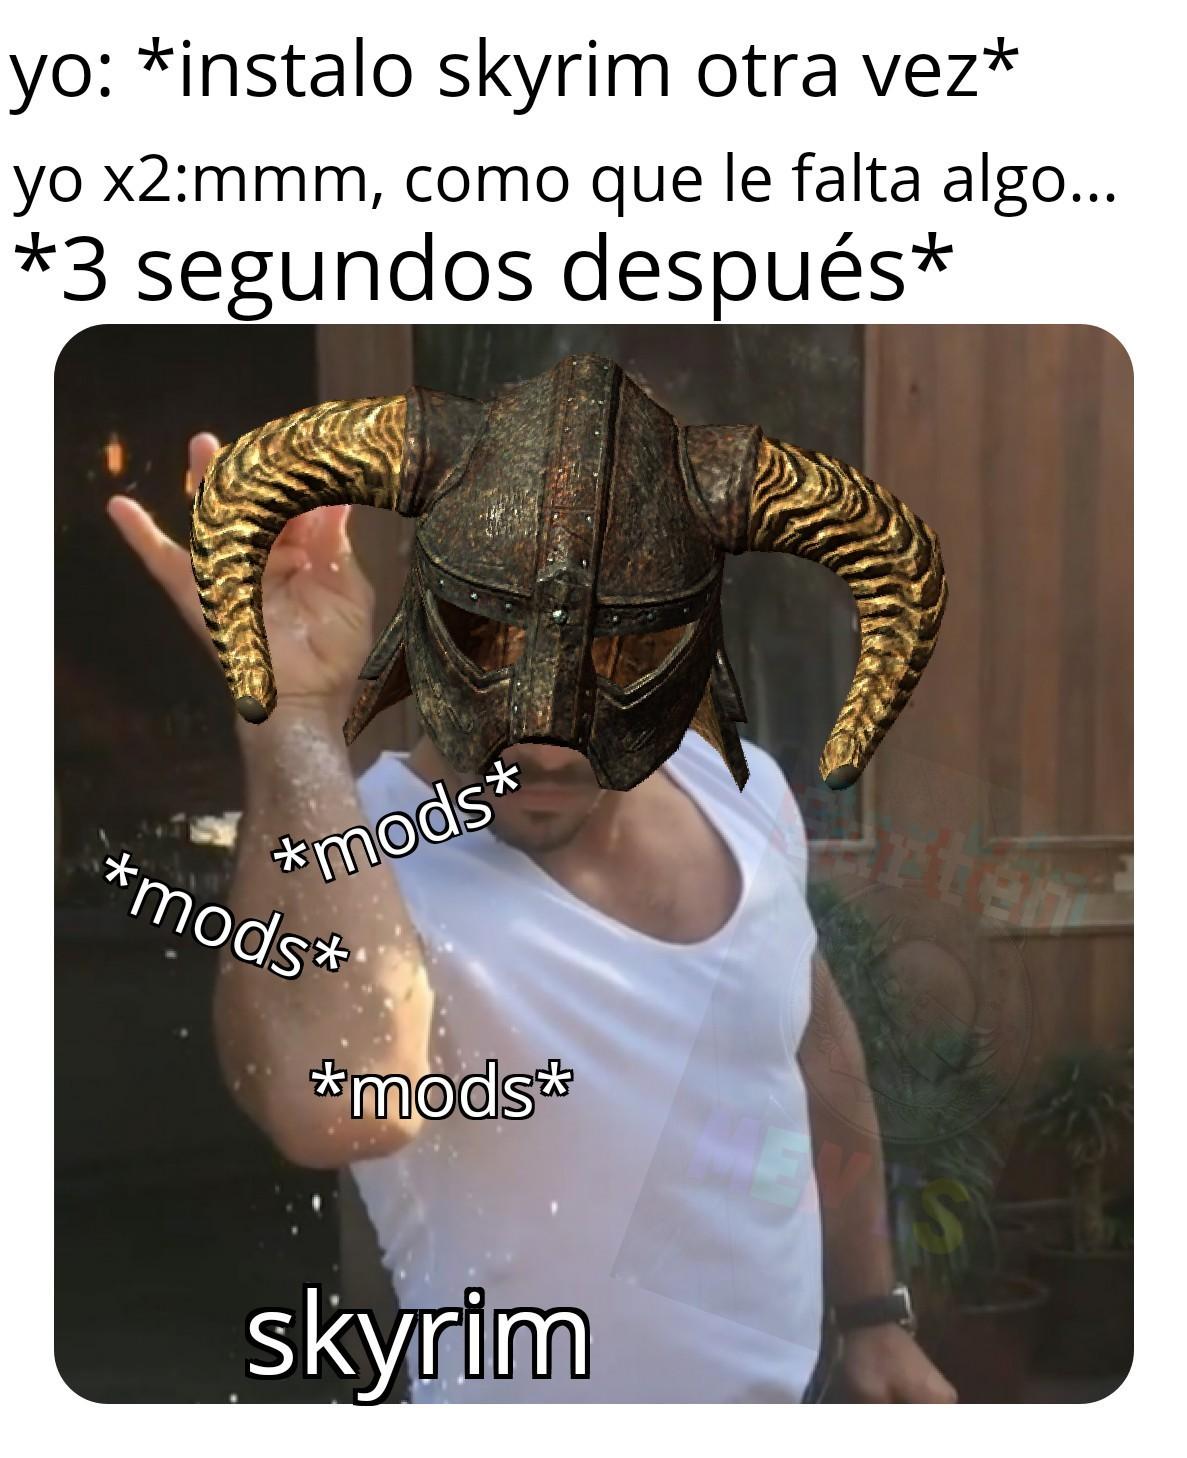 Skyrim: a home for chads - meme